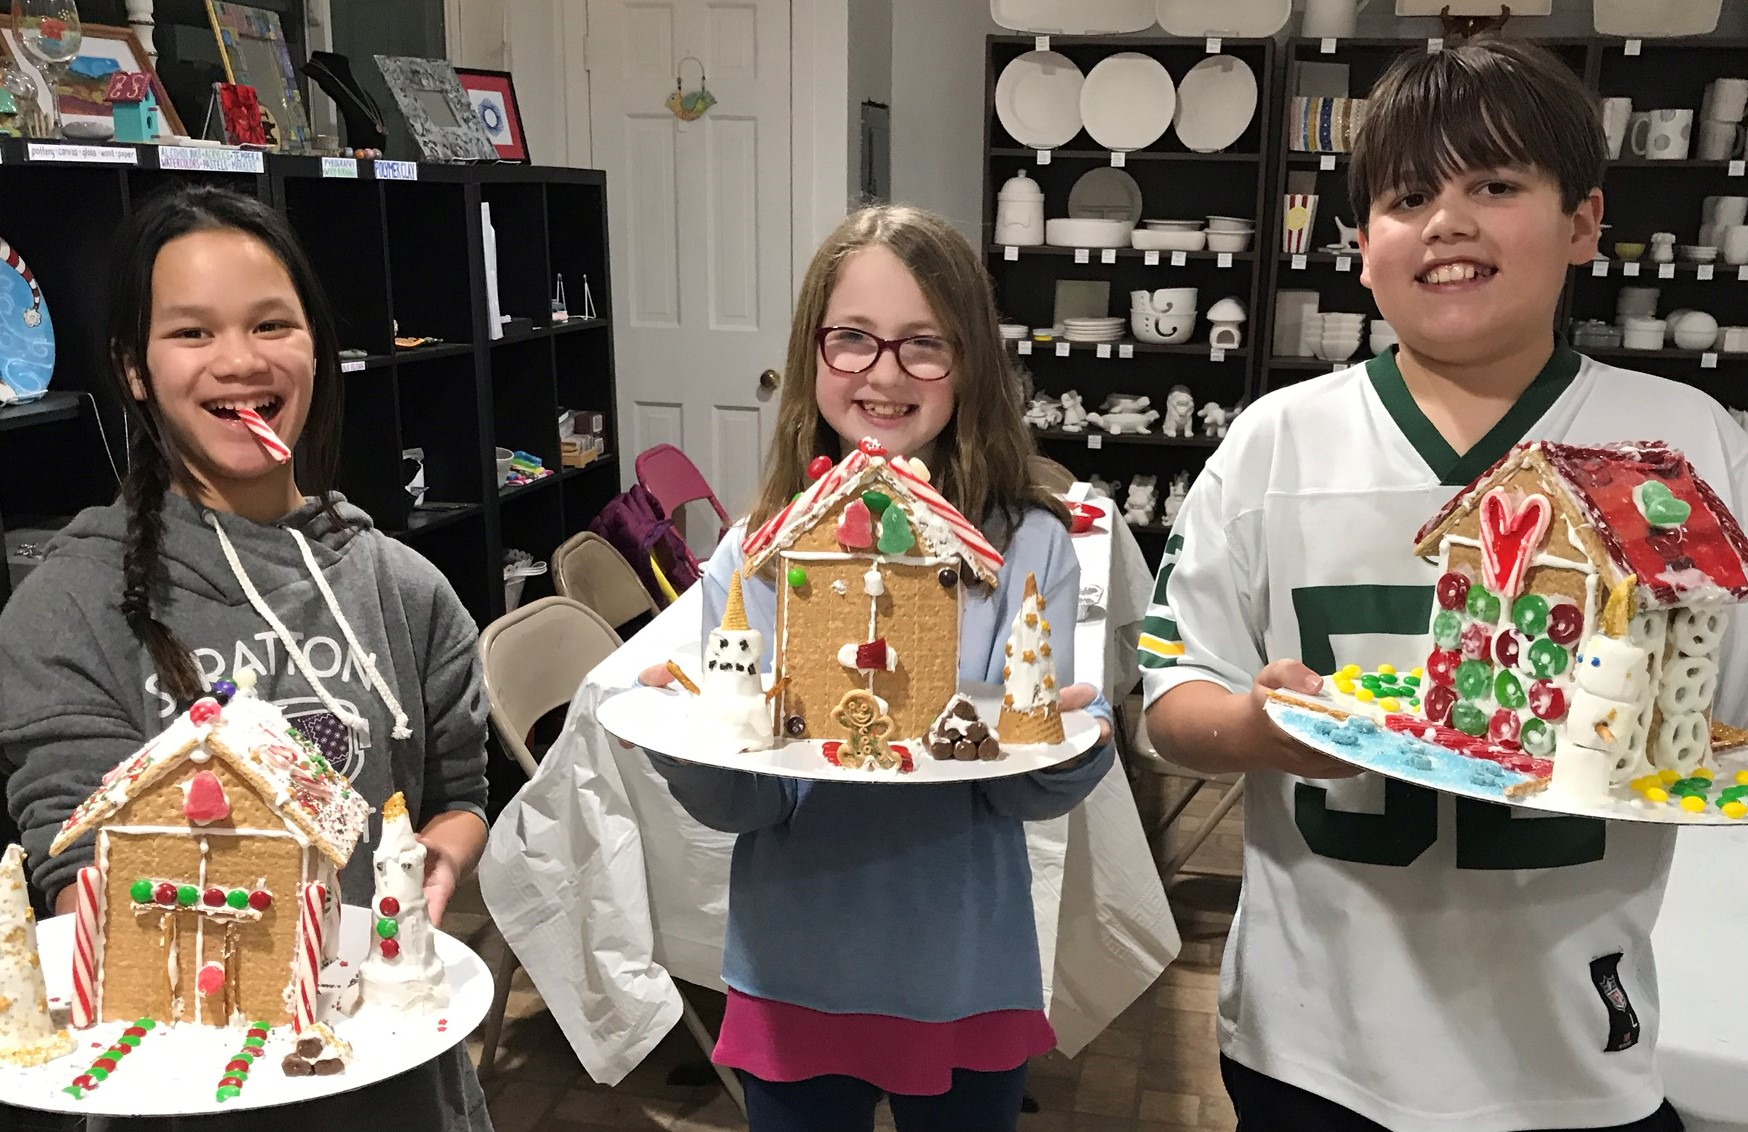 gingerbread house 7.jpeg